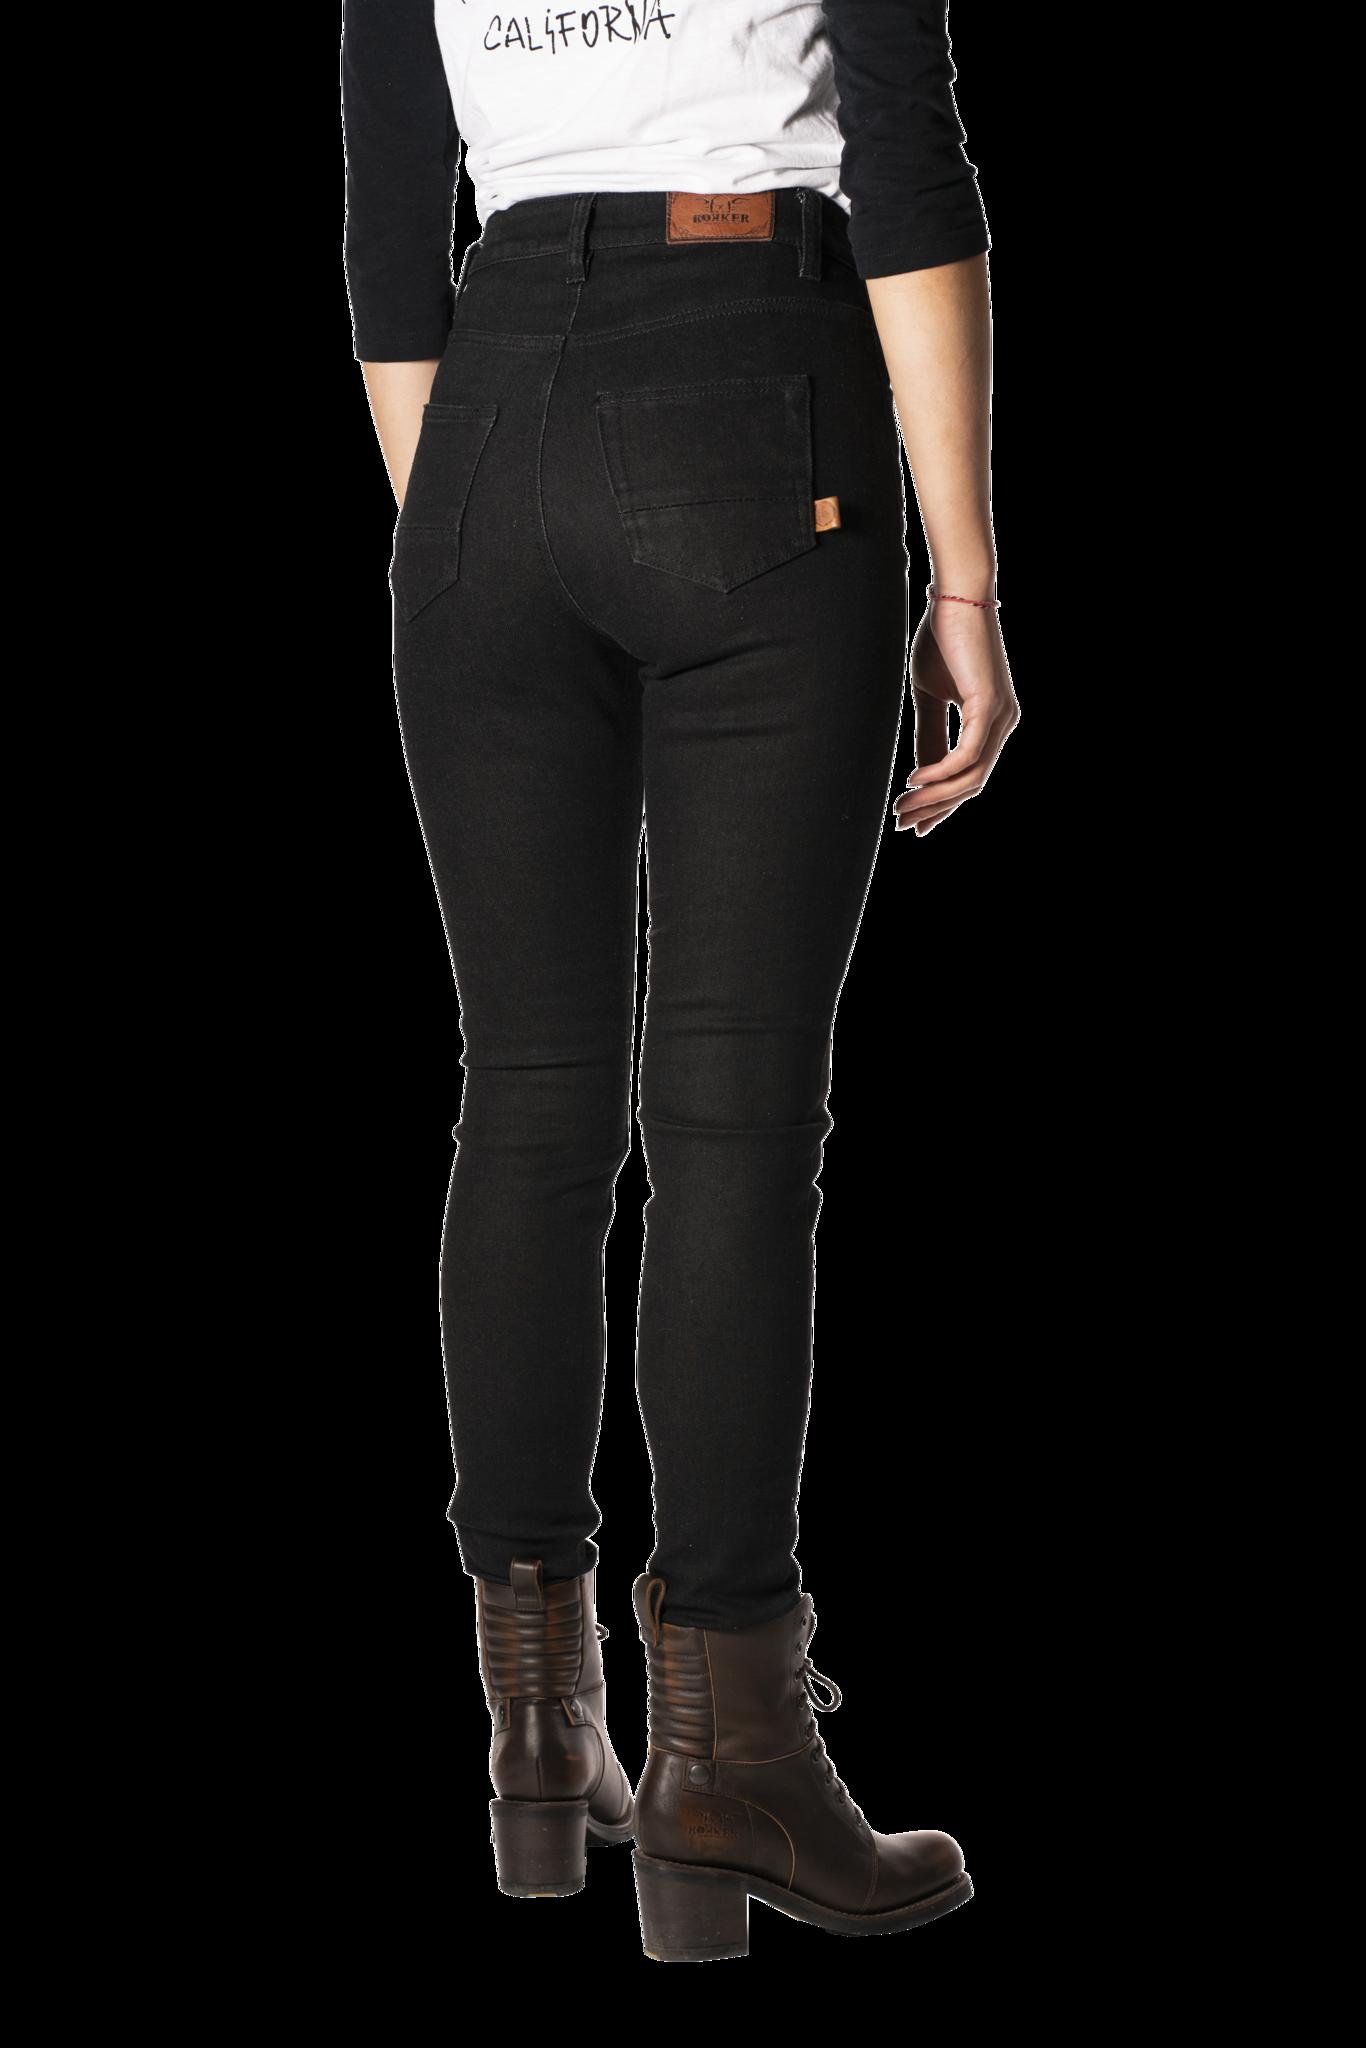 Rokkertech high waist black slim dames motorbroek L32-3